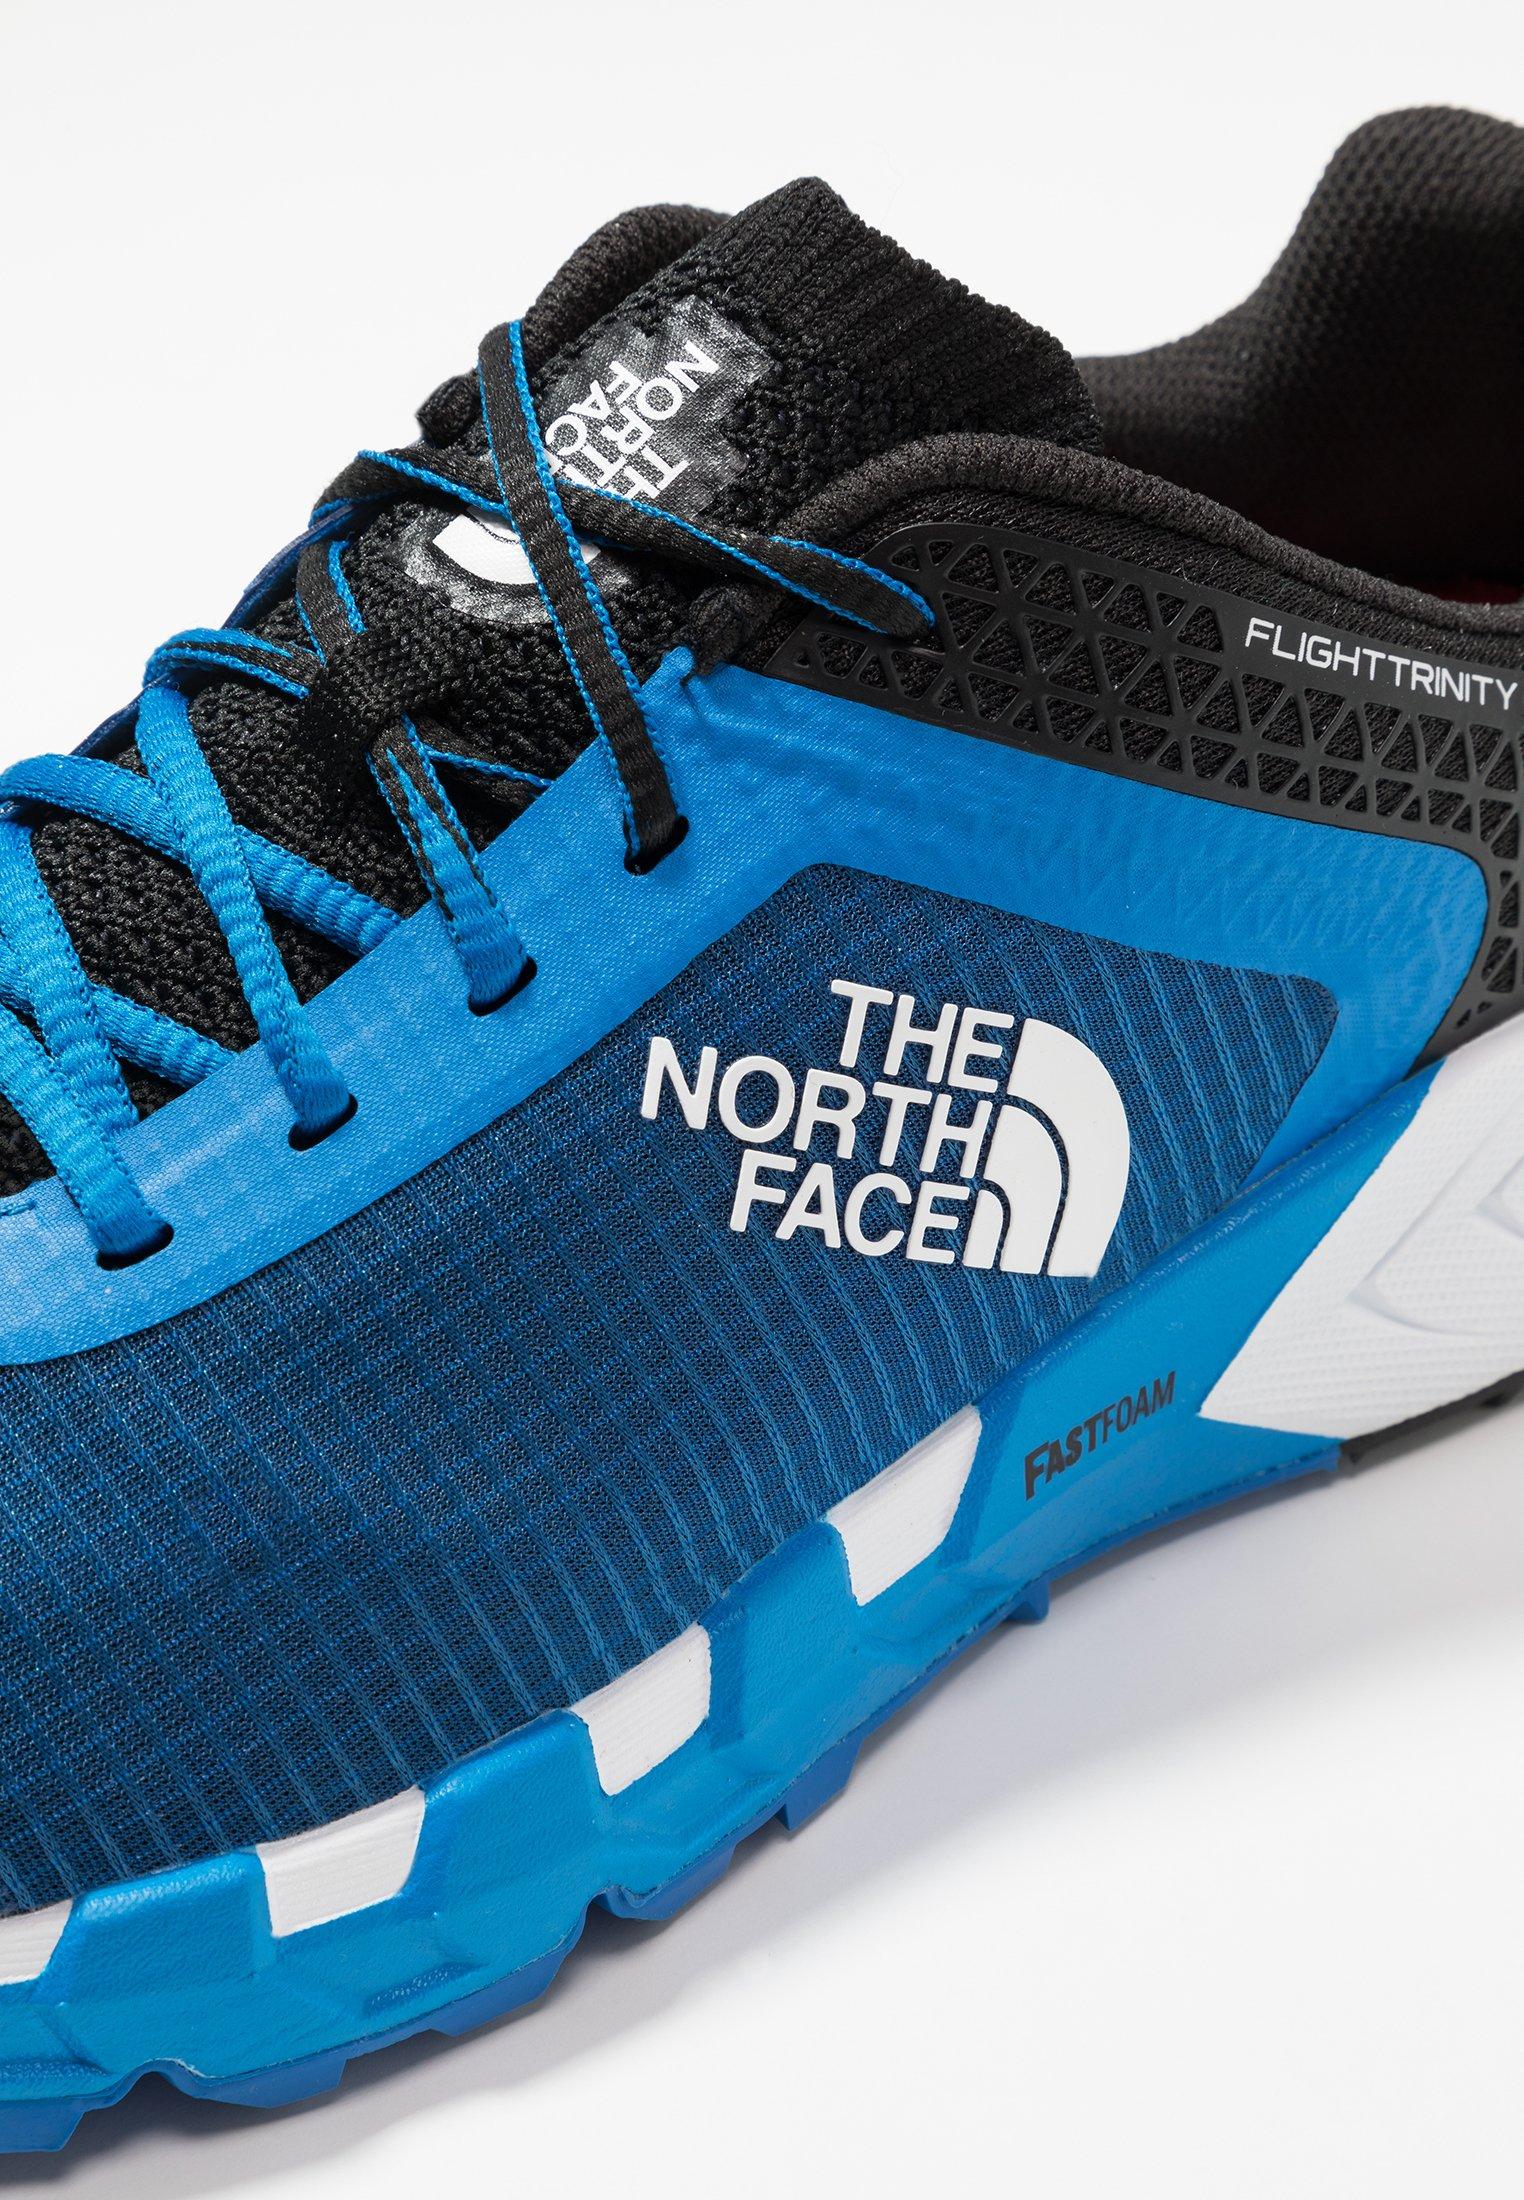 The North Face Løpesko for mark blackbaja blue Zalando.no